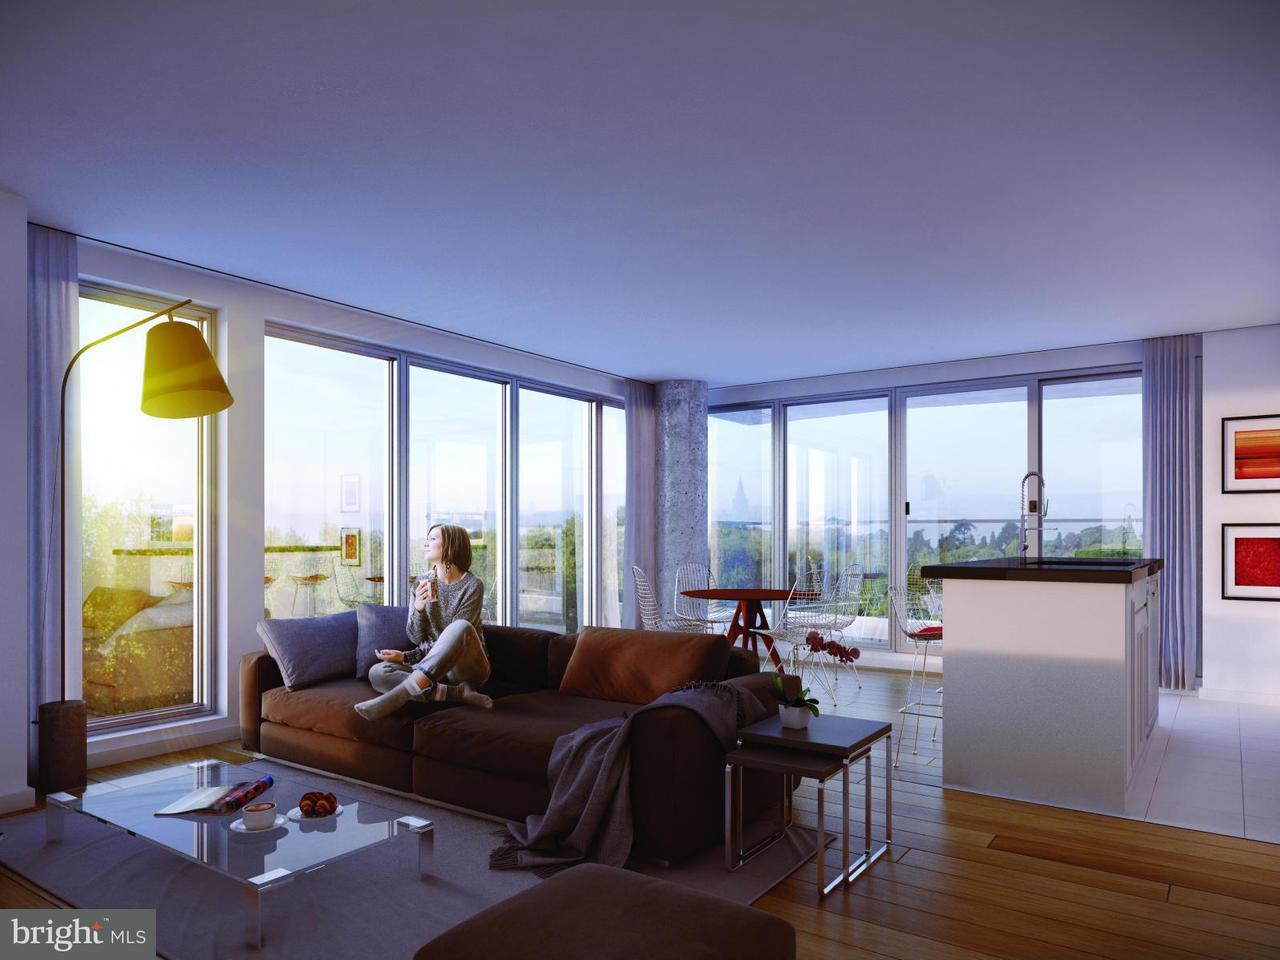 Condominium for Sale at 50 Florida Ave NE #418 Washington, District Of Columbia 20002 United States